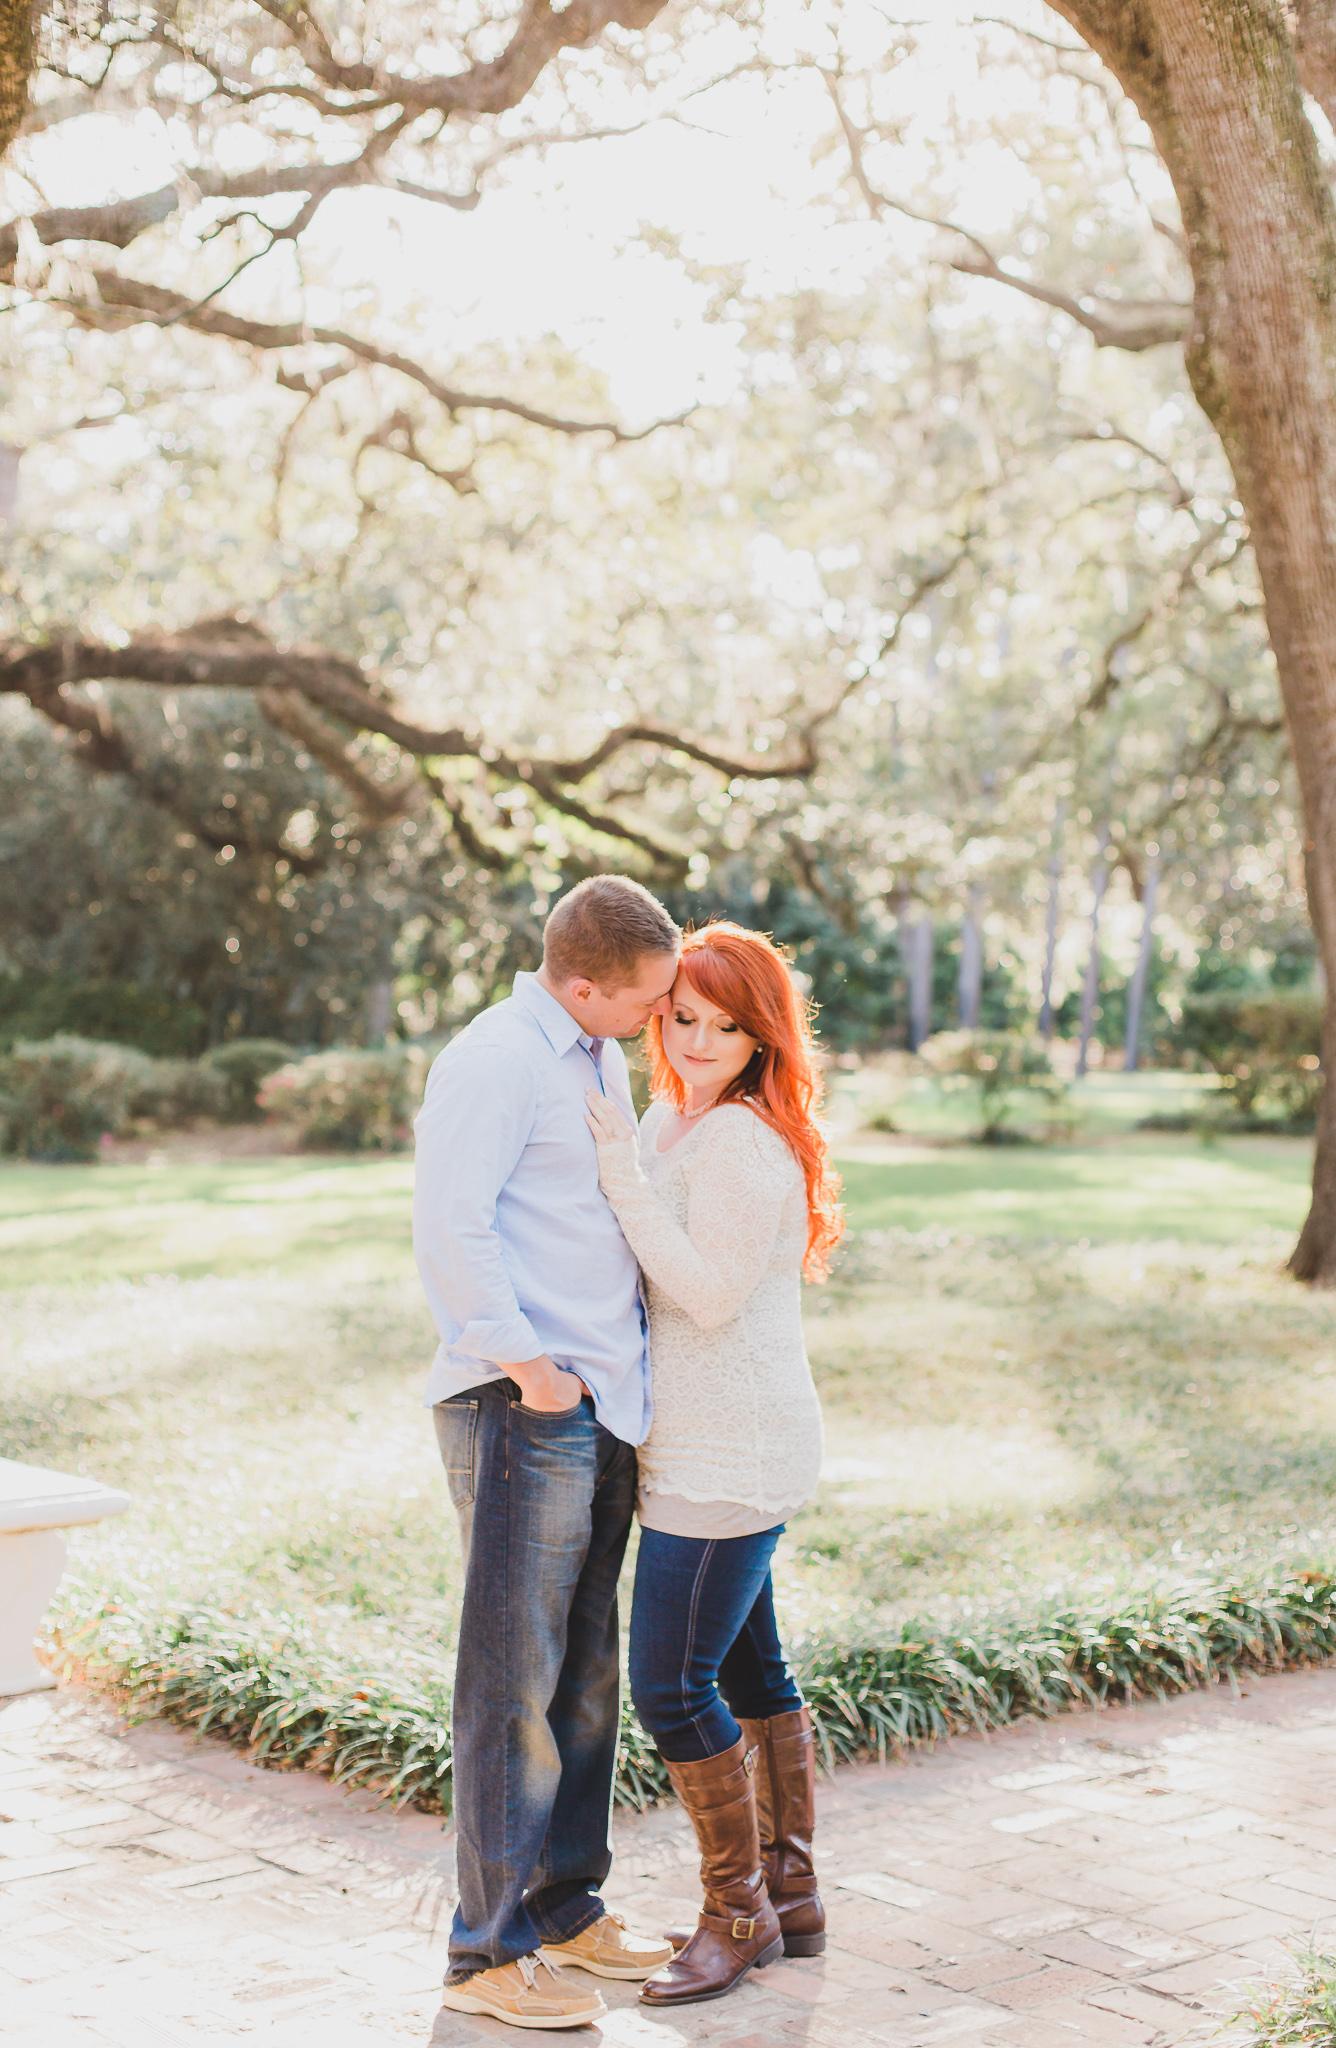 Engaged couple standing under trees in eden garden state park